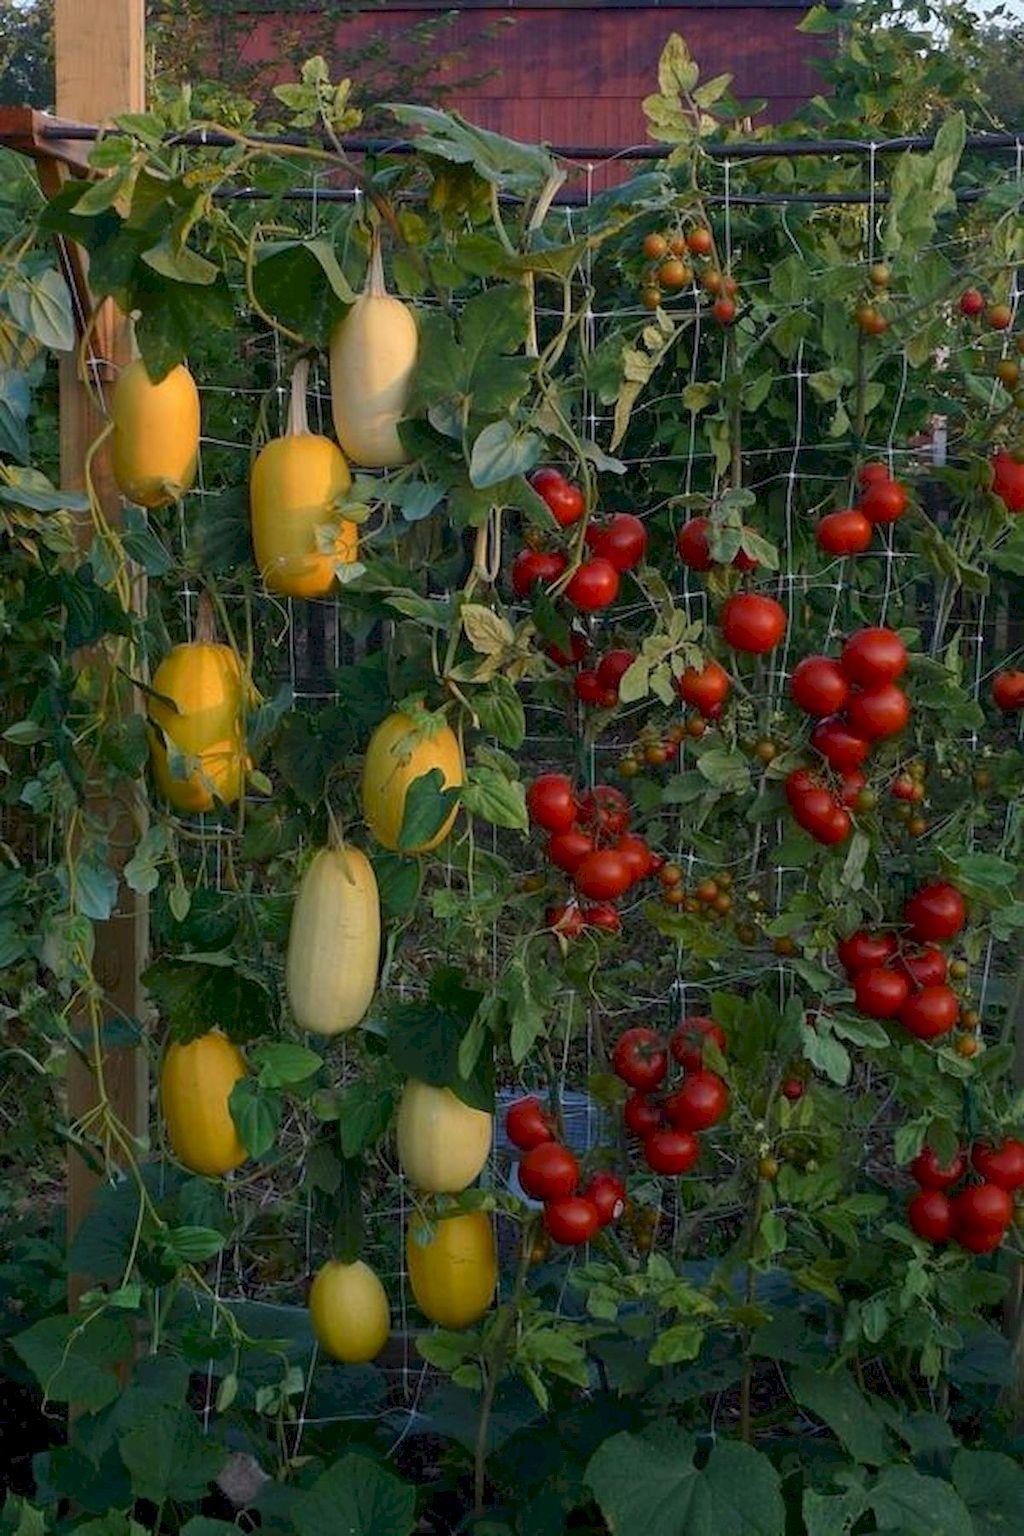 75 Stunning Backyard Vegetable Garden Design Ideas - Homekover #veggiegardens